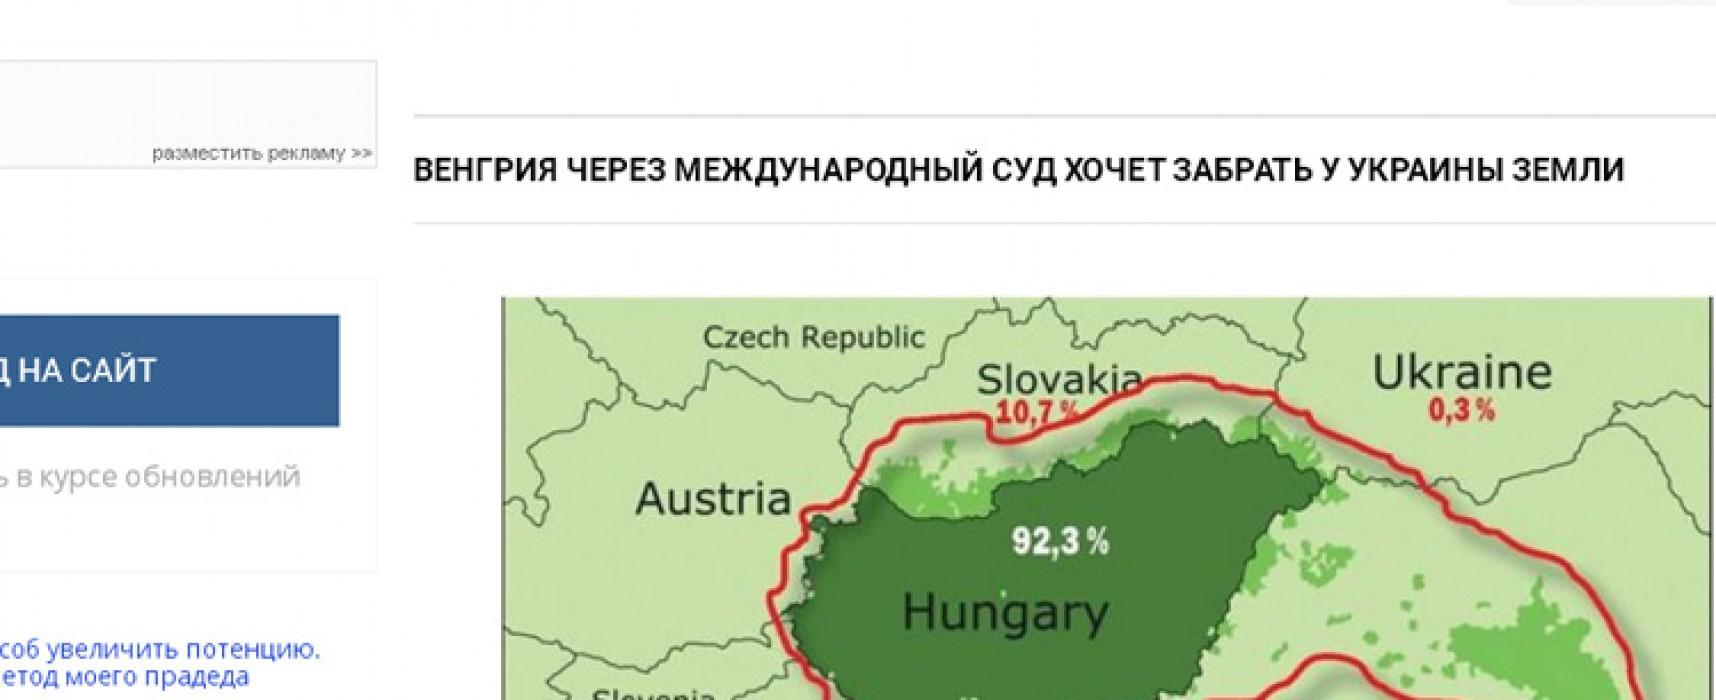 Journalist Claims that Hungary Can Reclaim Ukrainian Territory through International Court